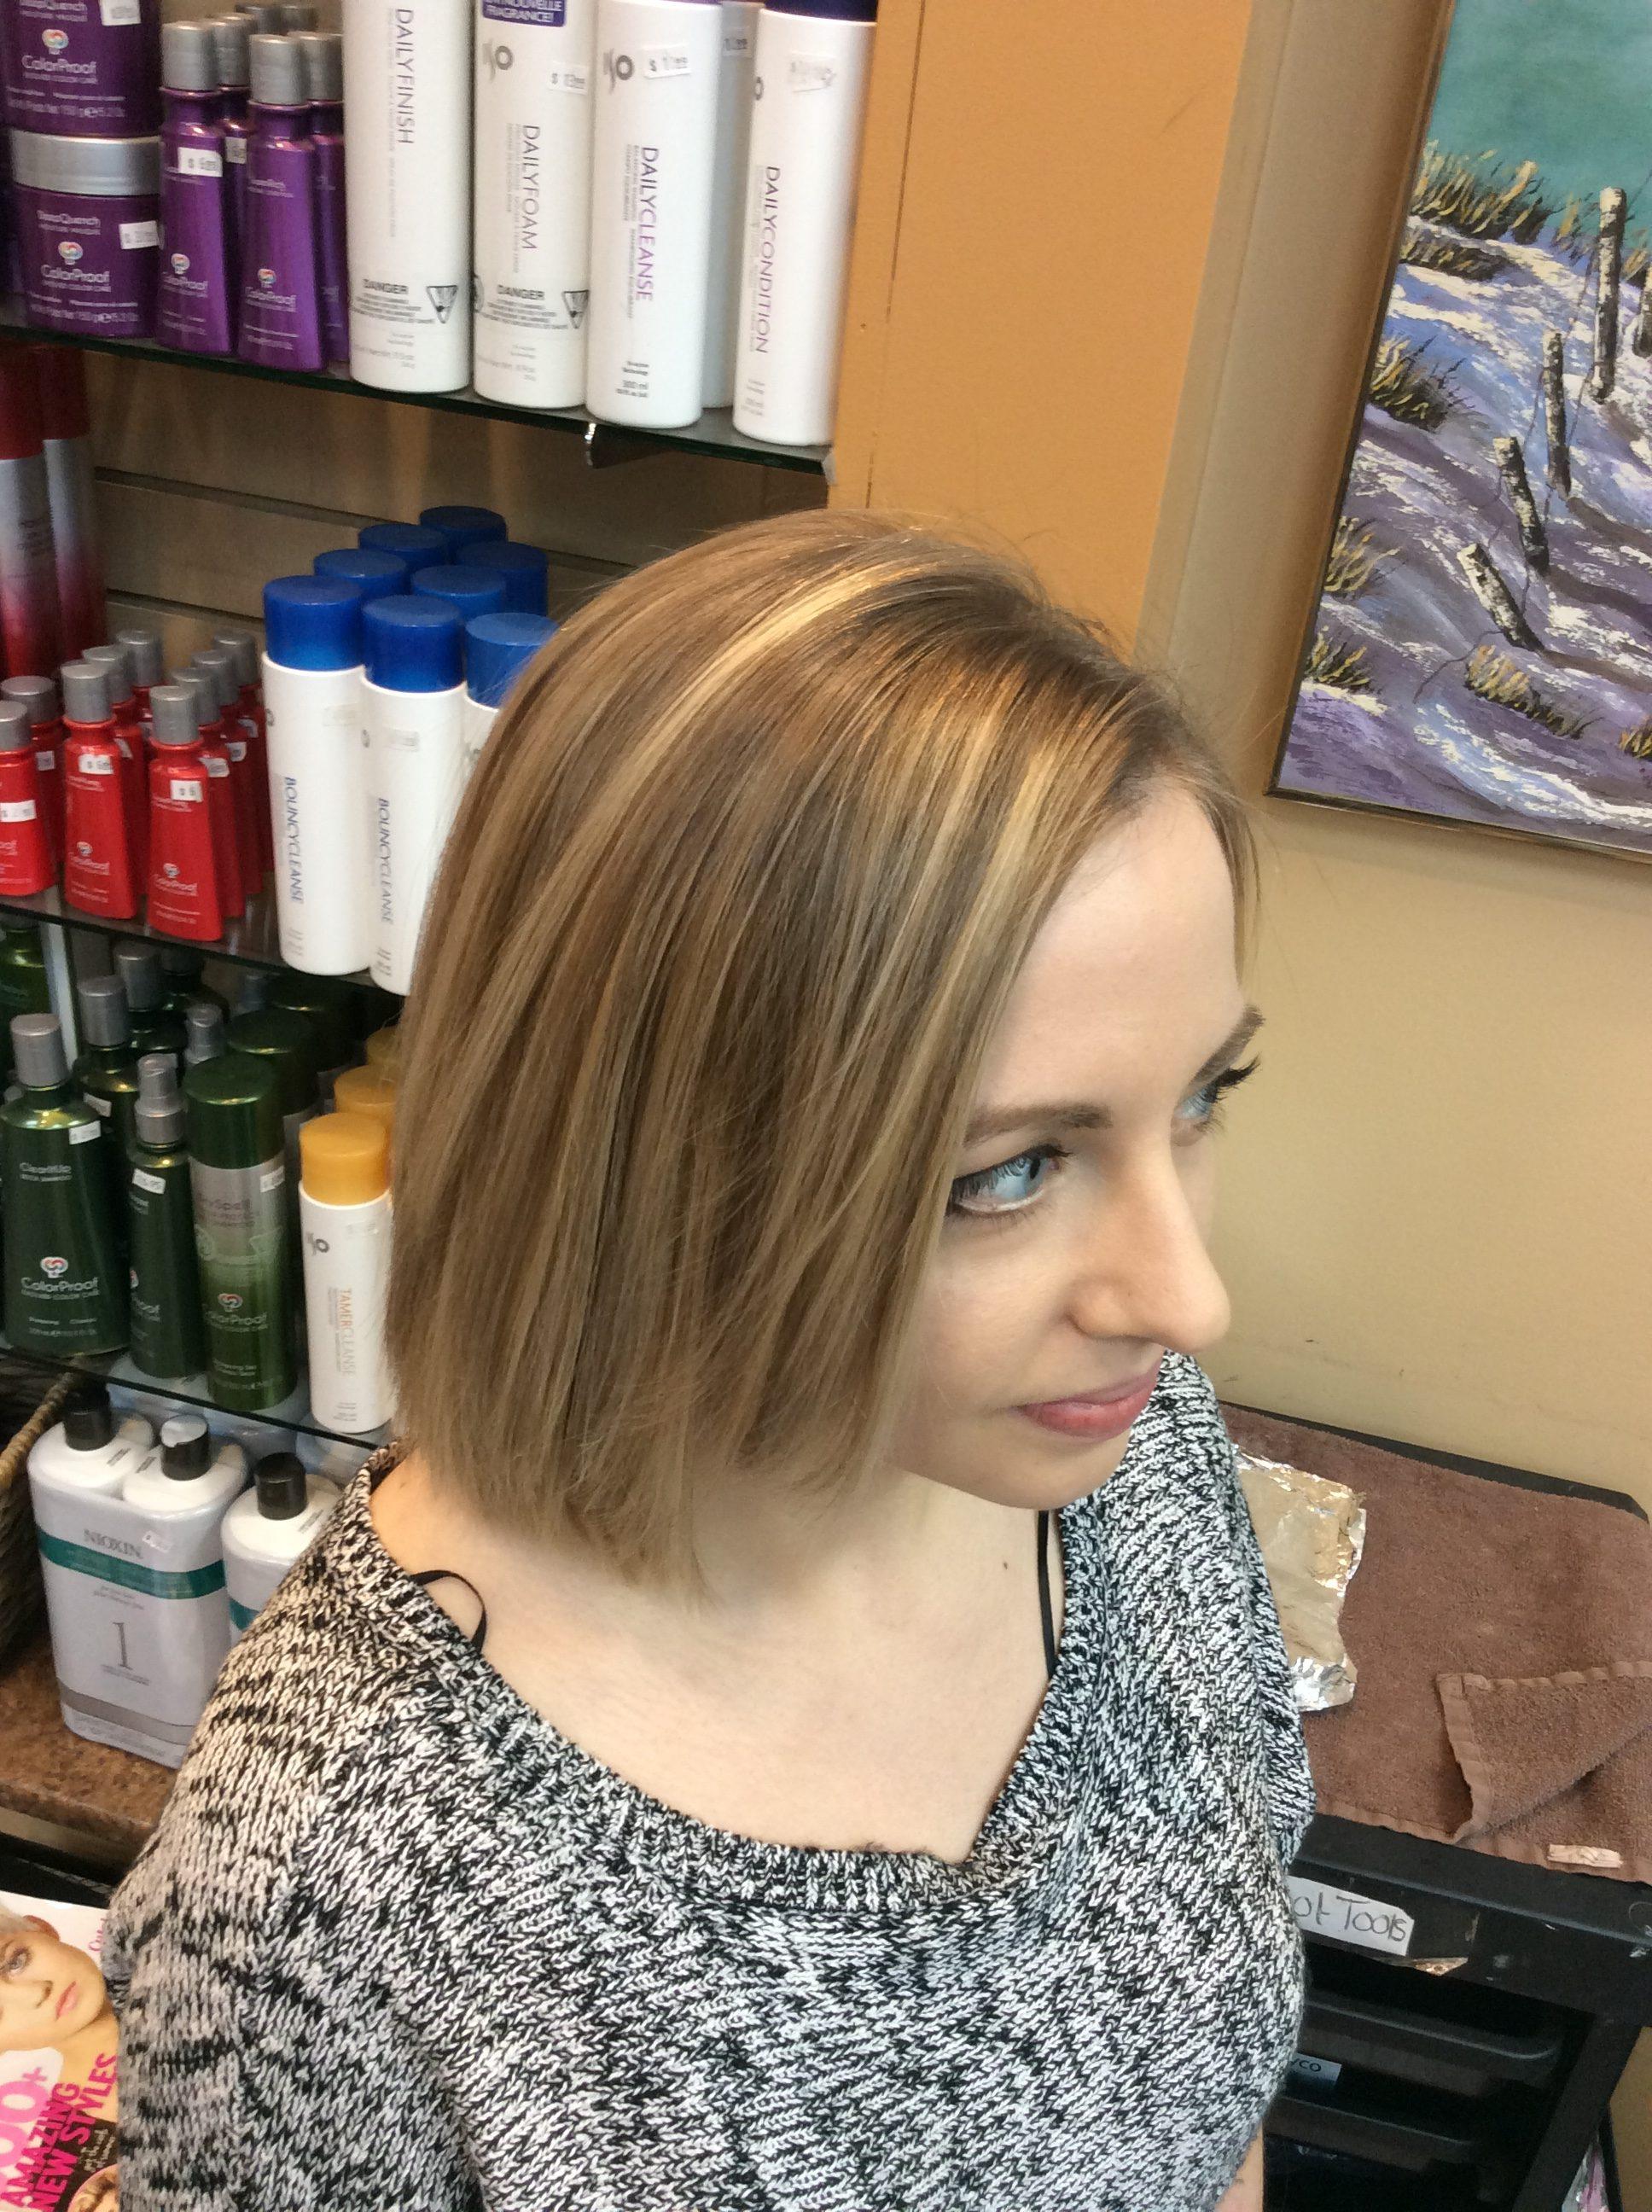 Female with Bob hair style at hairstyle inn Saskatoon